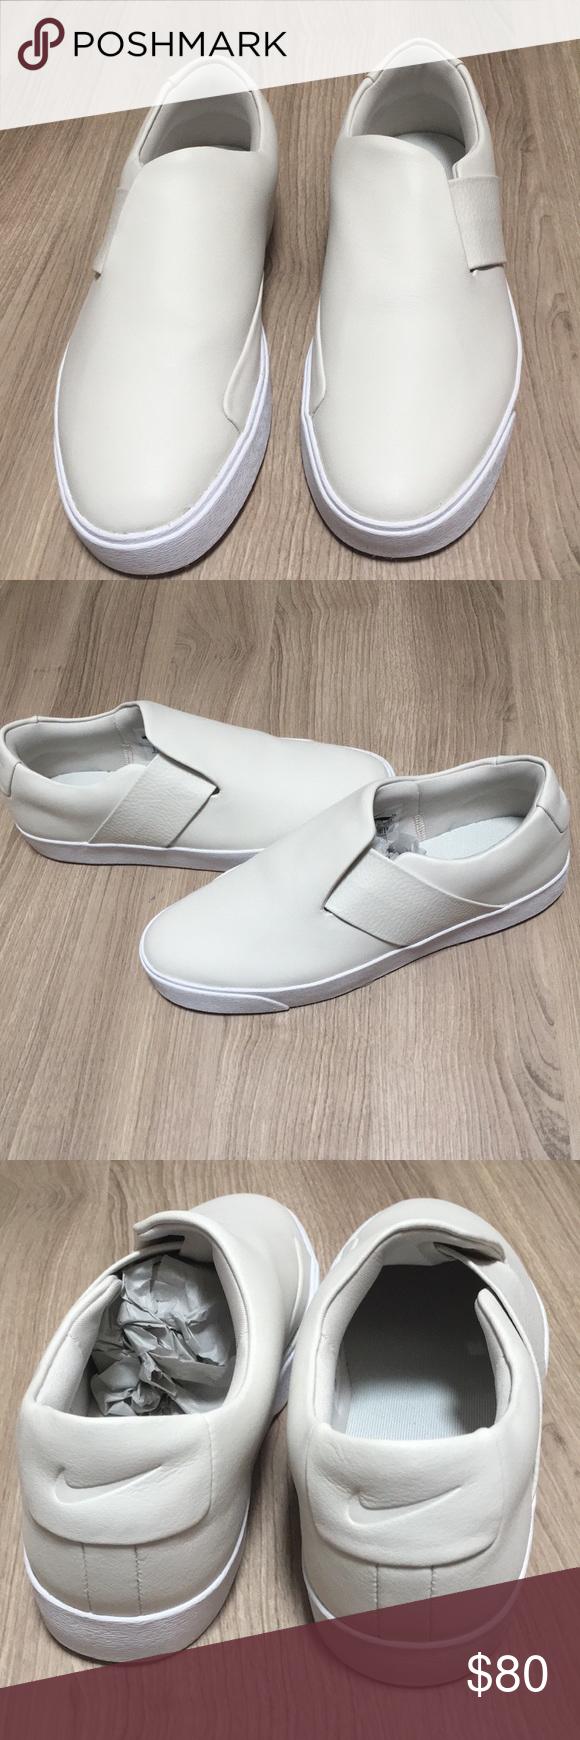 Nike blazer, Womens shoes sneakers, Nike